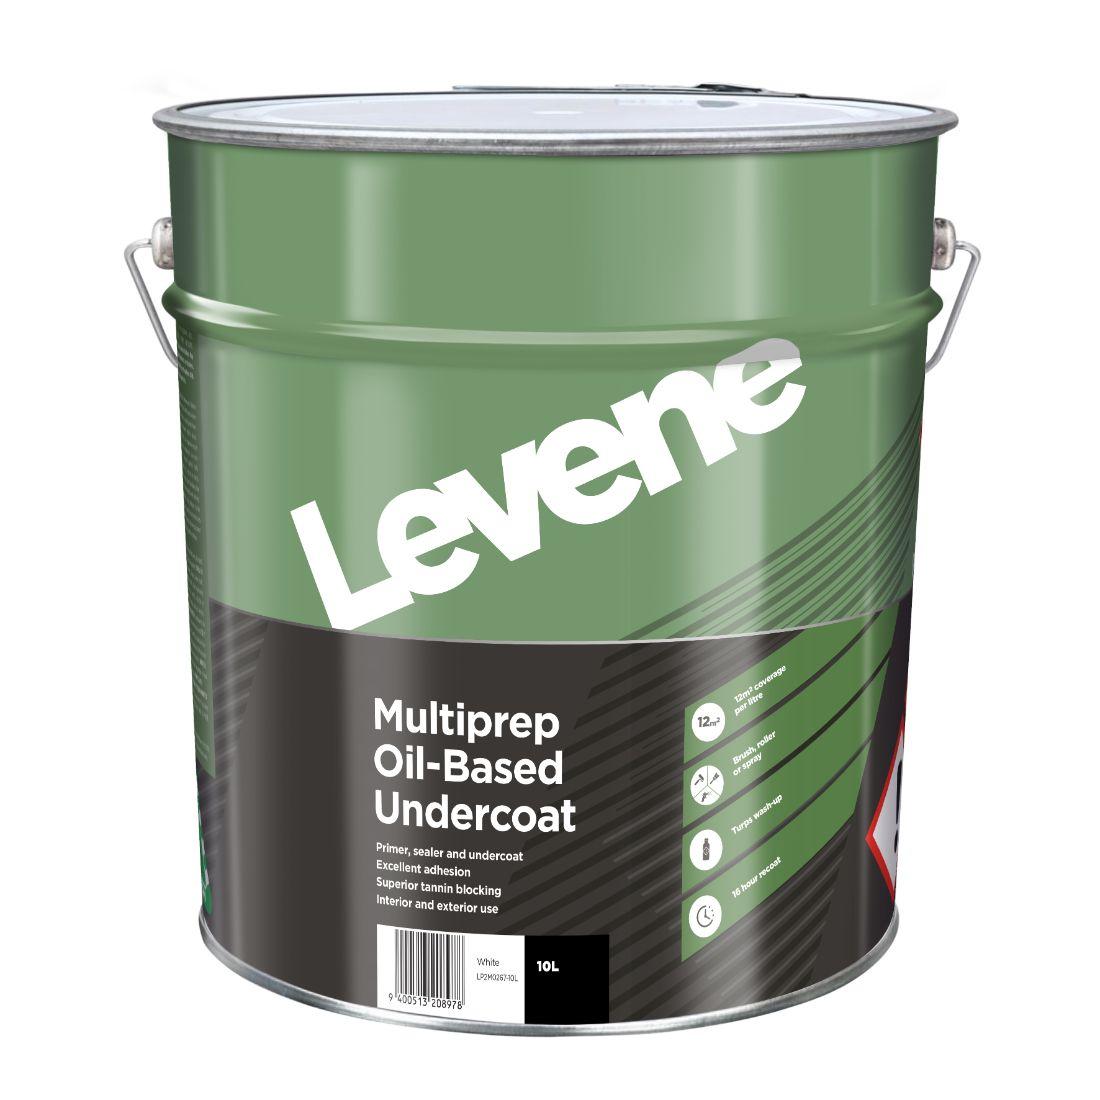 Multiprep Oil-Based Undercoat 10L